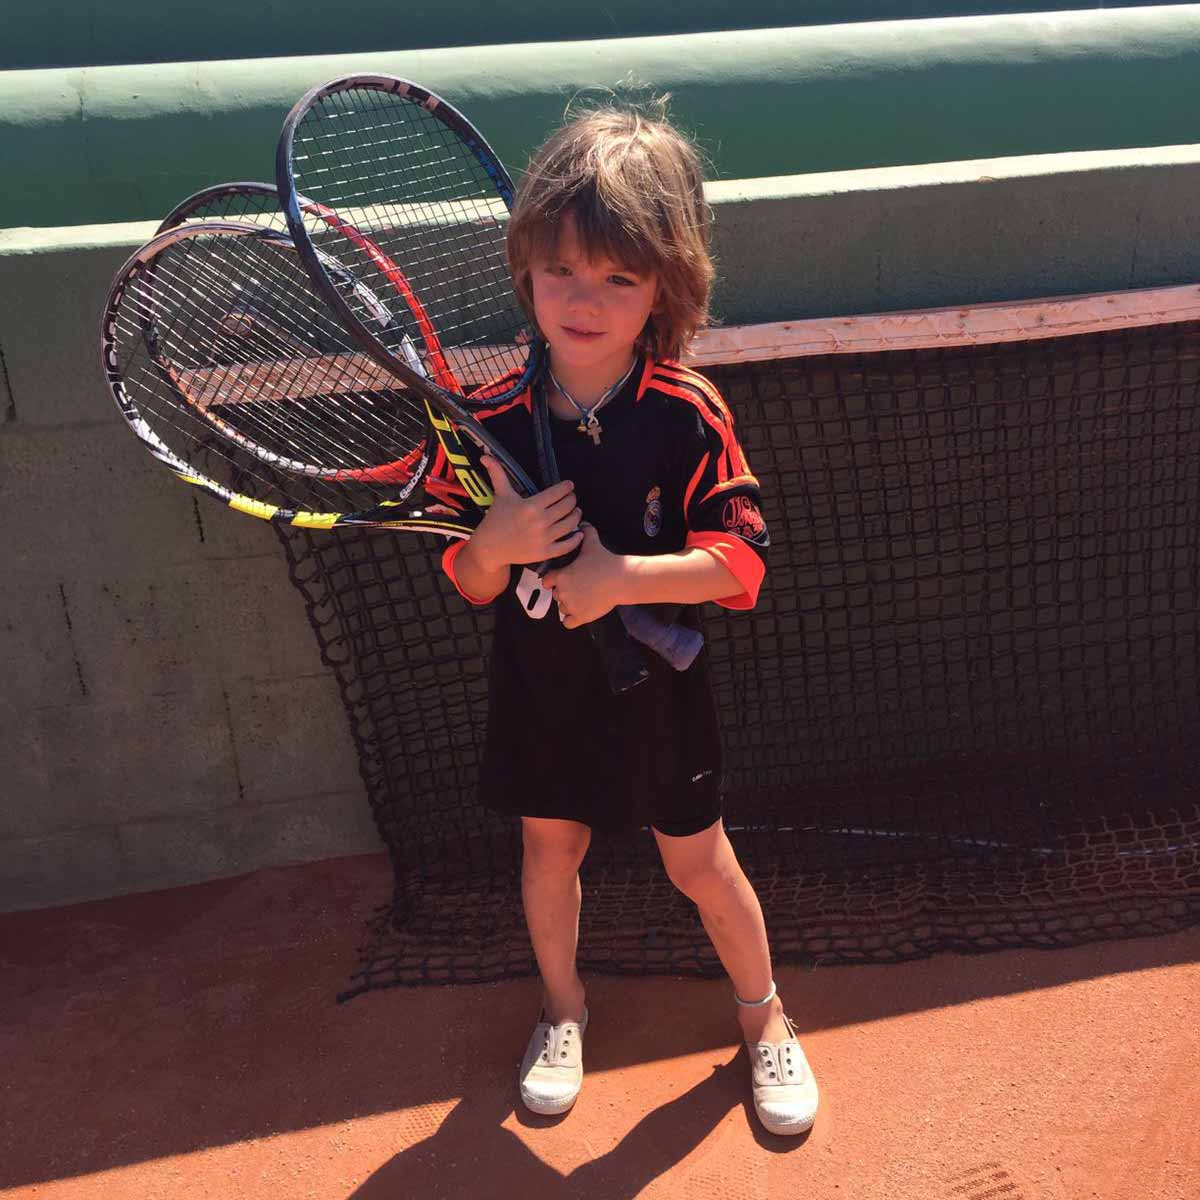 samanthavallejonagera_vacaciones_tenis